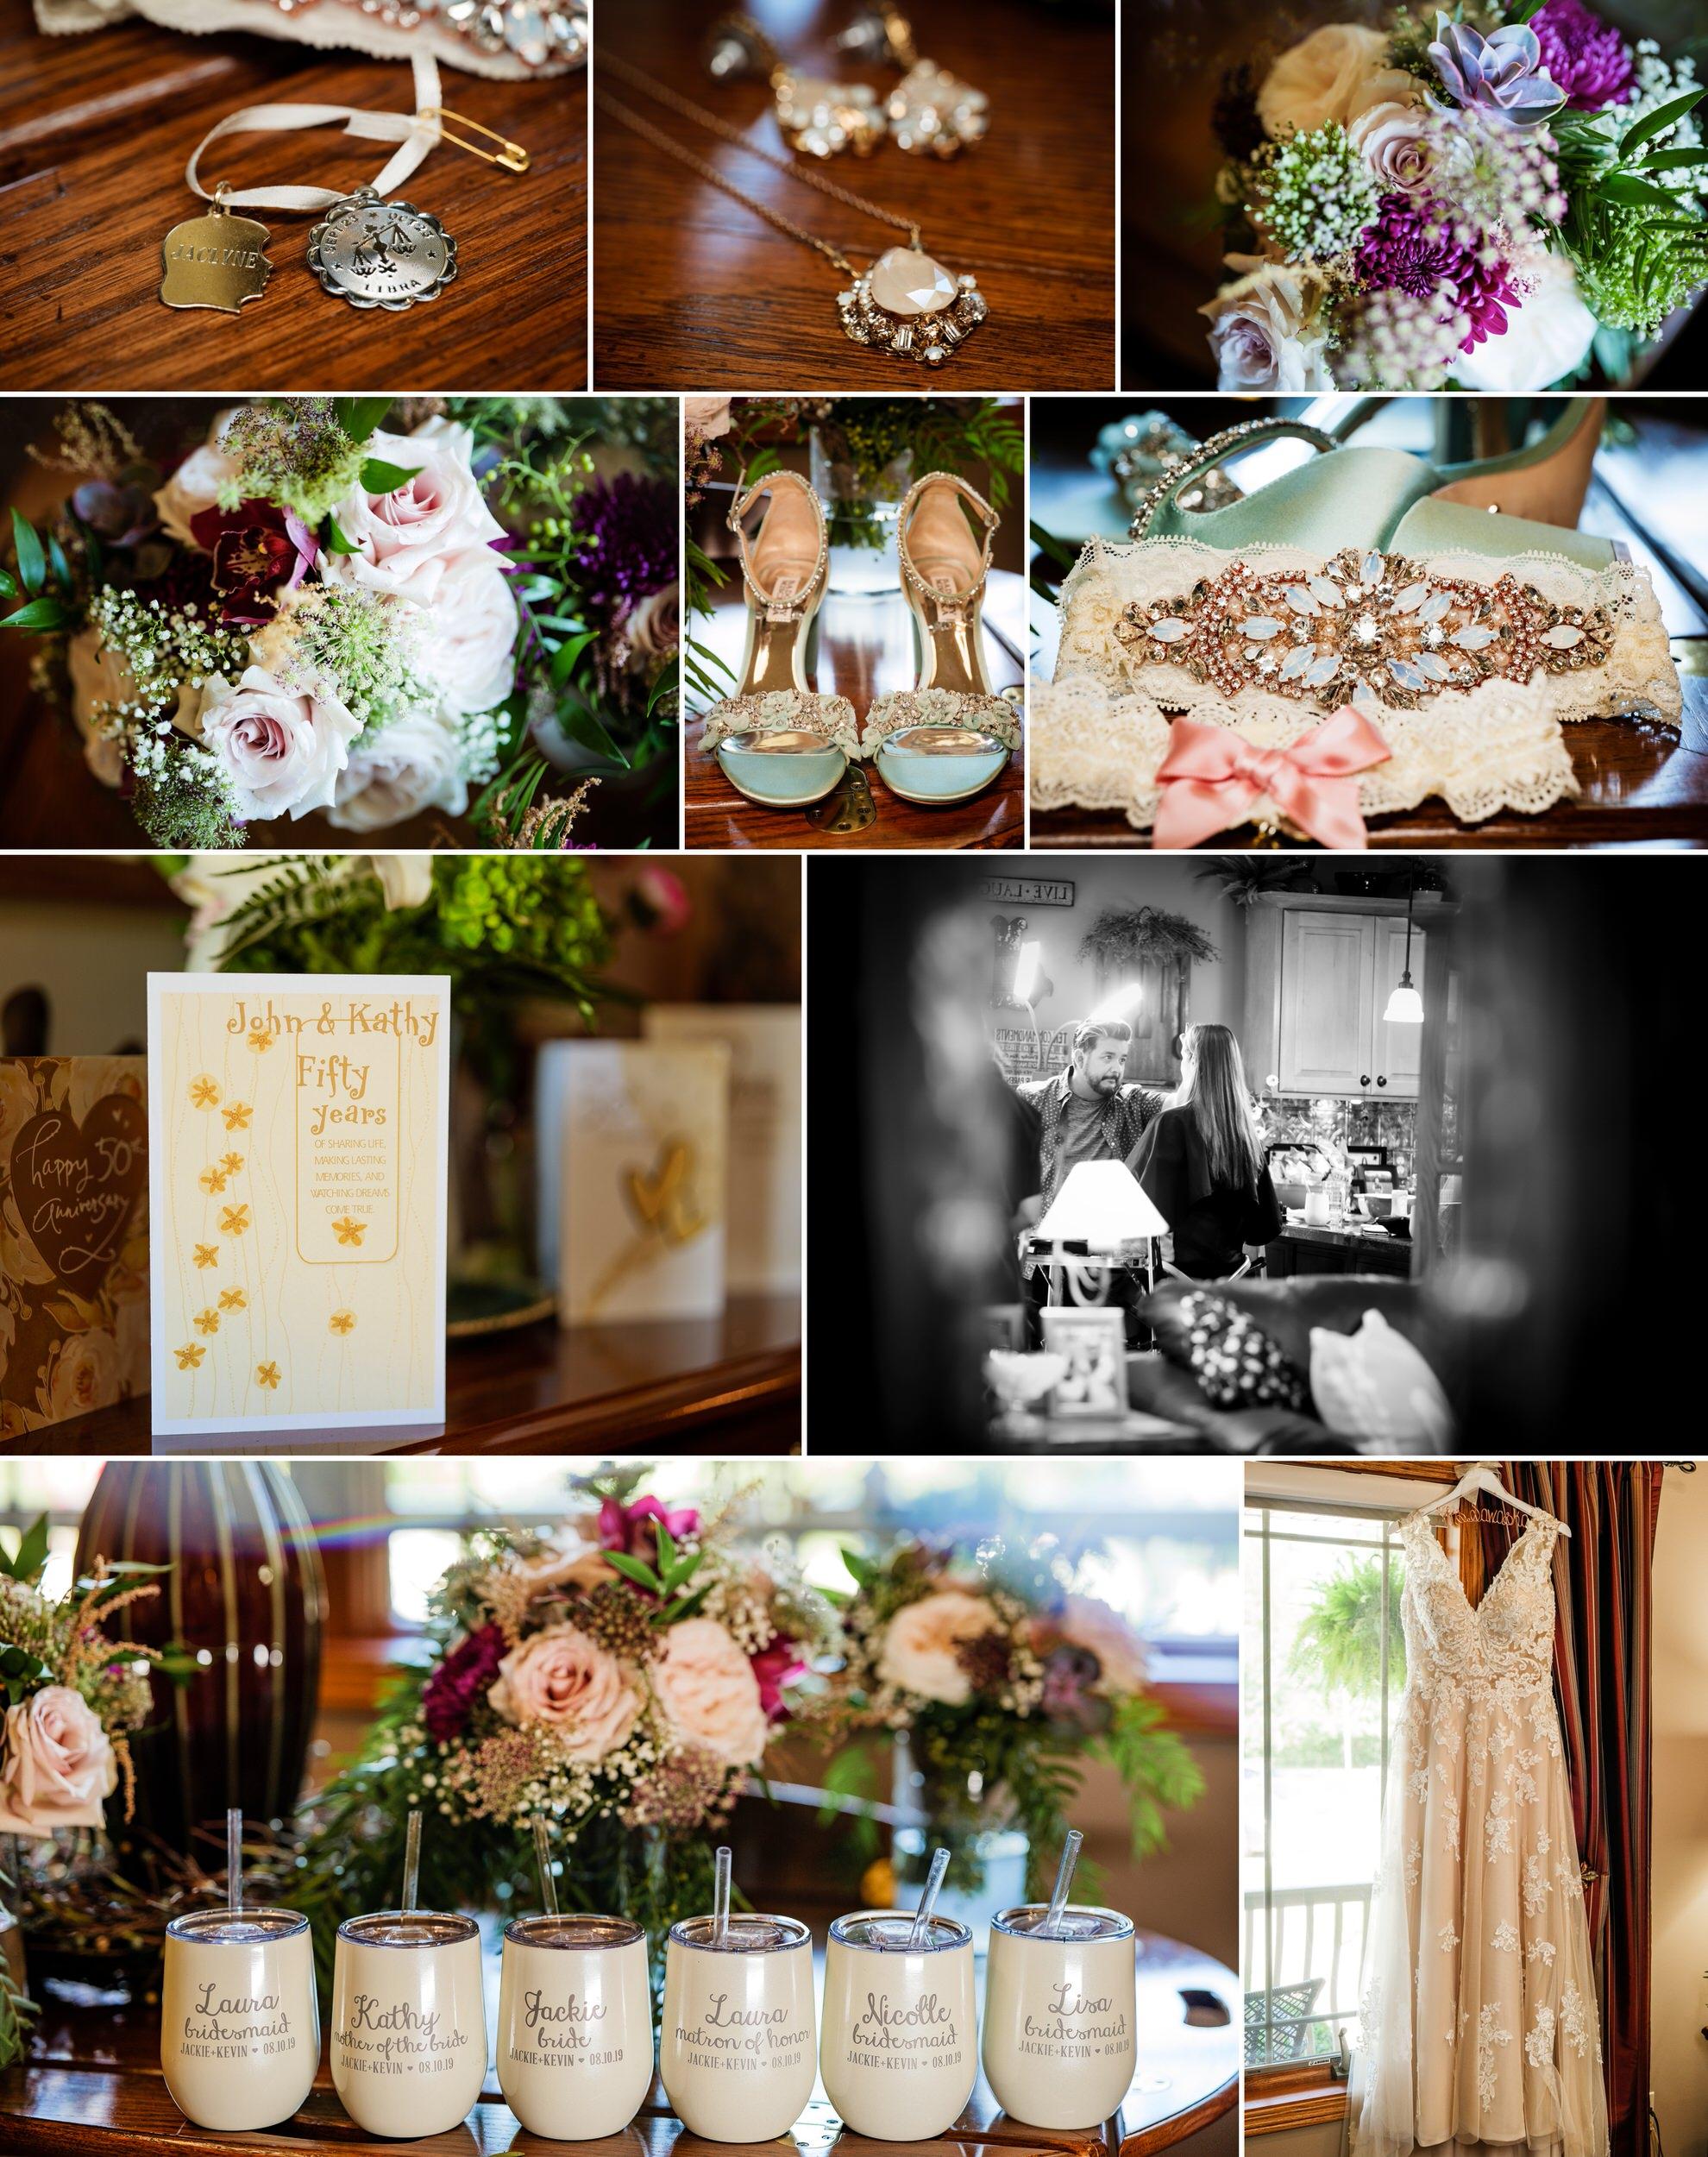 Bridal details for a summer wedding in Cedar Lake, Indiana.